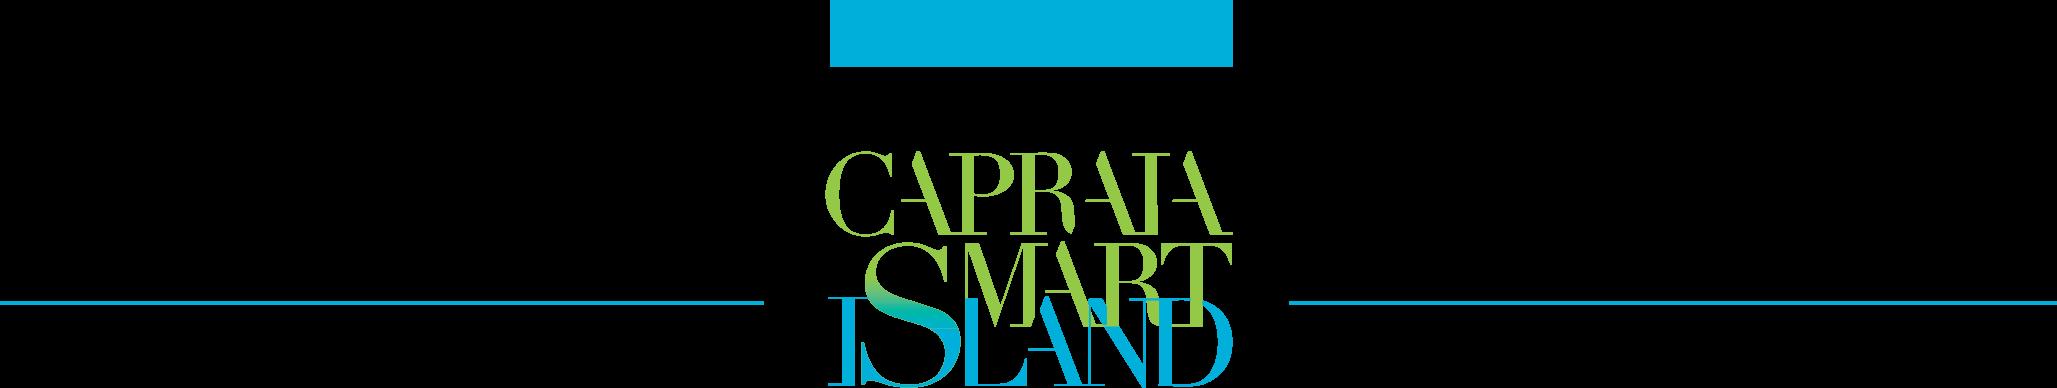 Capraia Smart Island - 2019 @ Capraia Isola